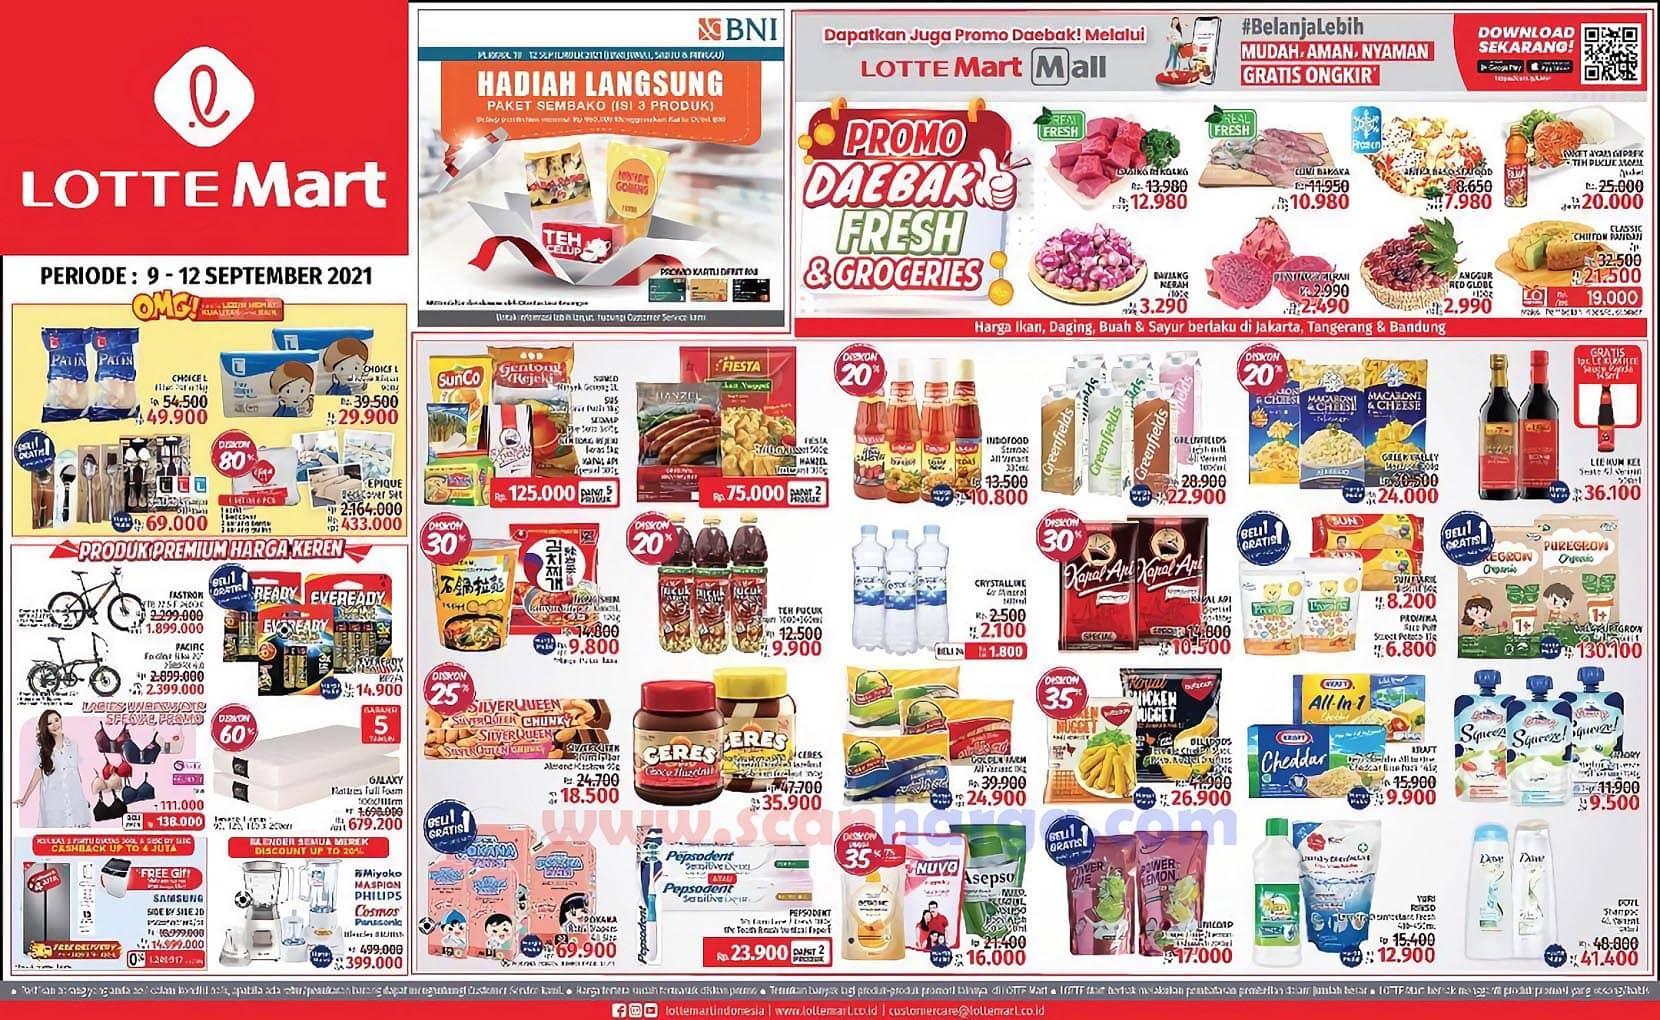 Katalog Promo Lottemart Weekend 9 - 12 September 2021